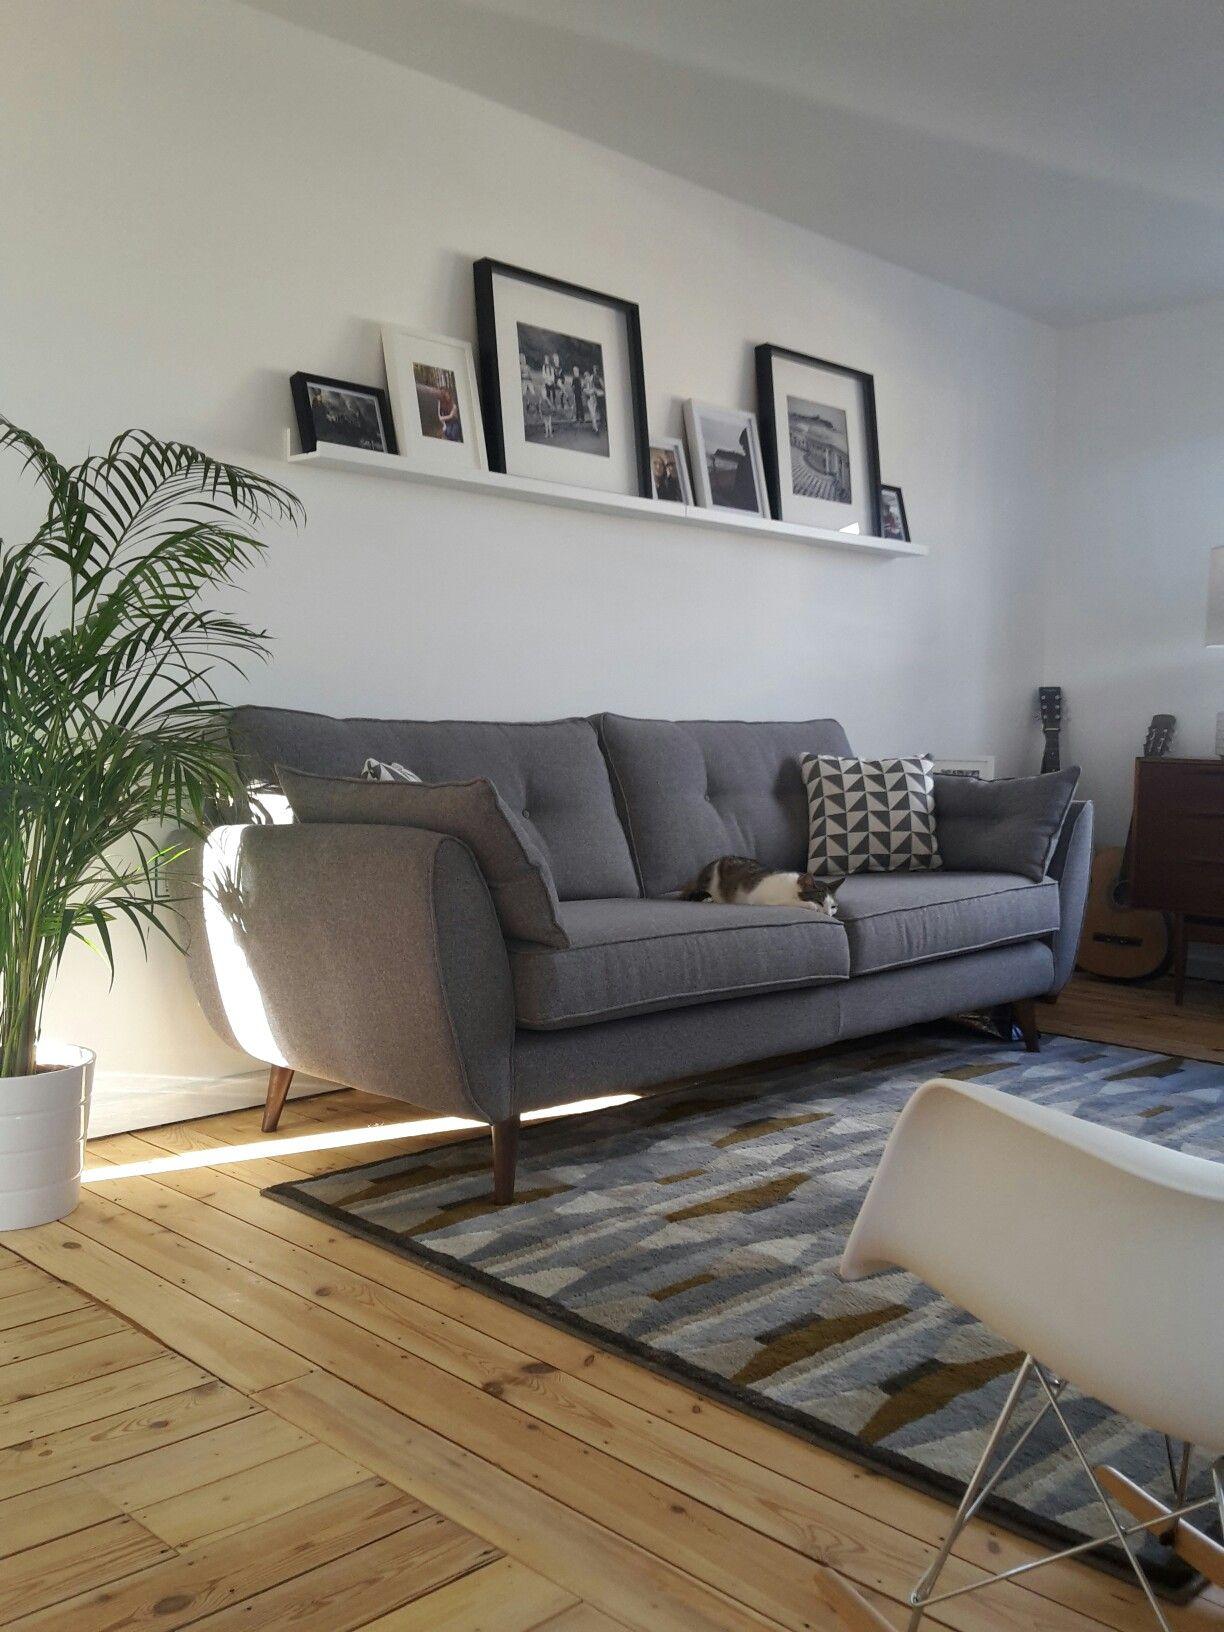 Ledersofa modern  sofa and modern chair | My apartament | Pinterest | Modern chairs ...